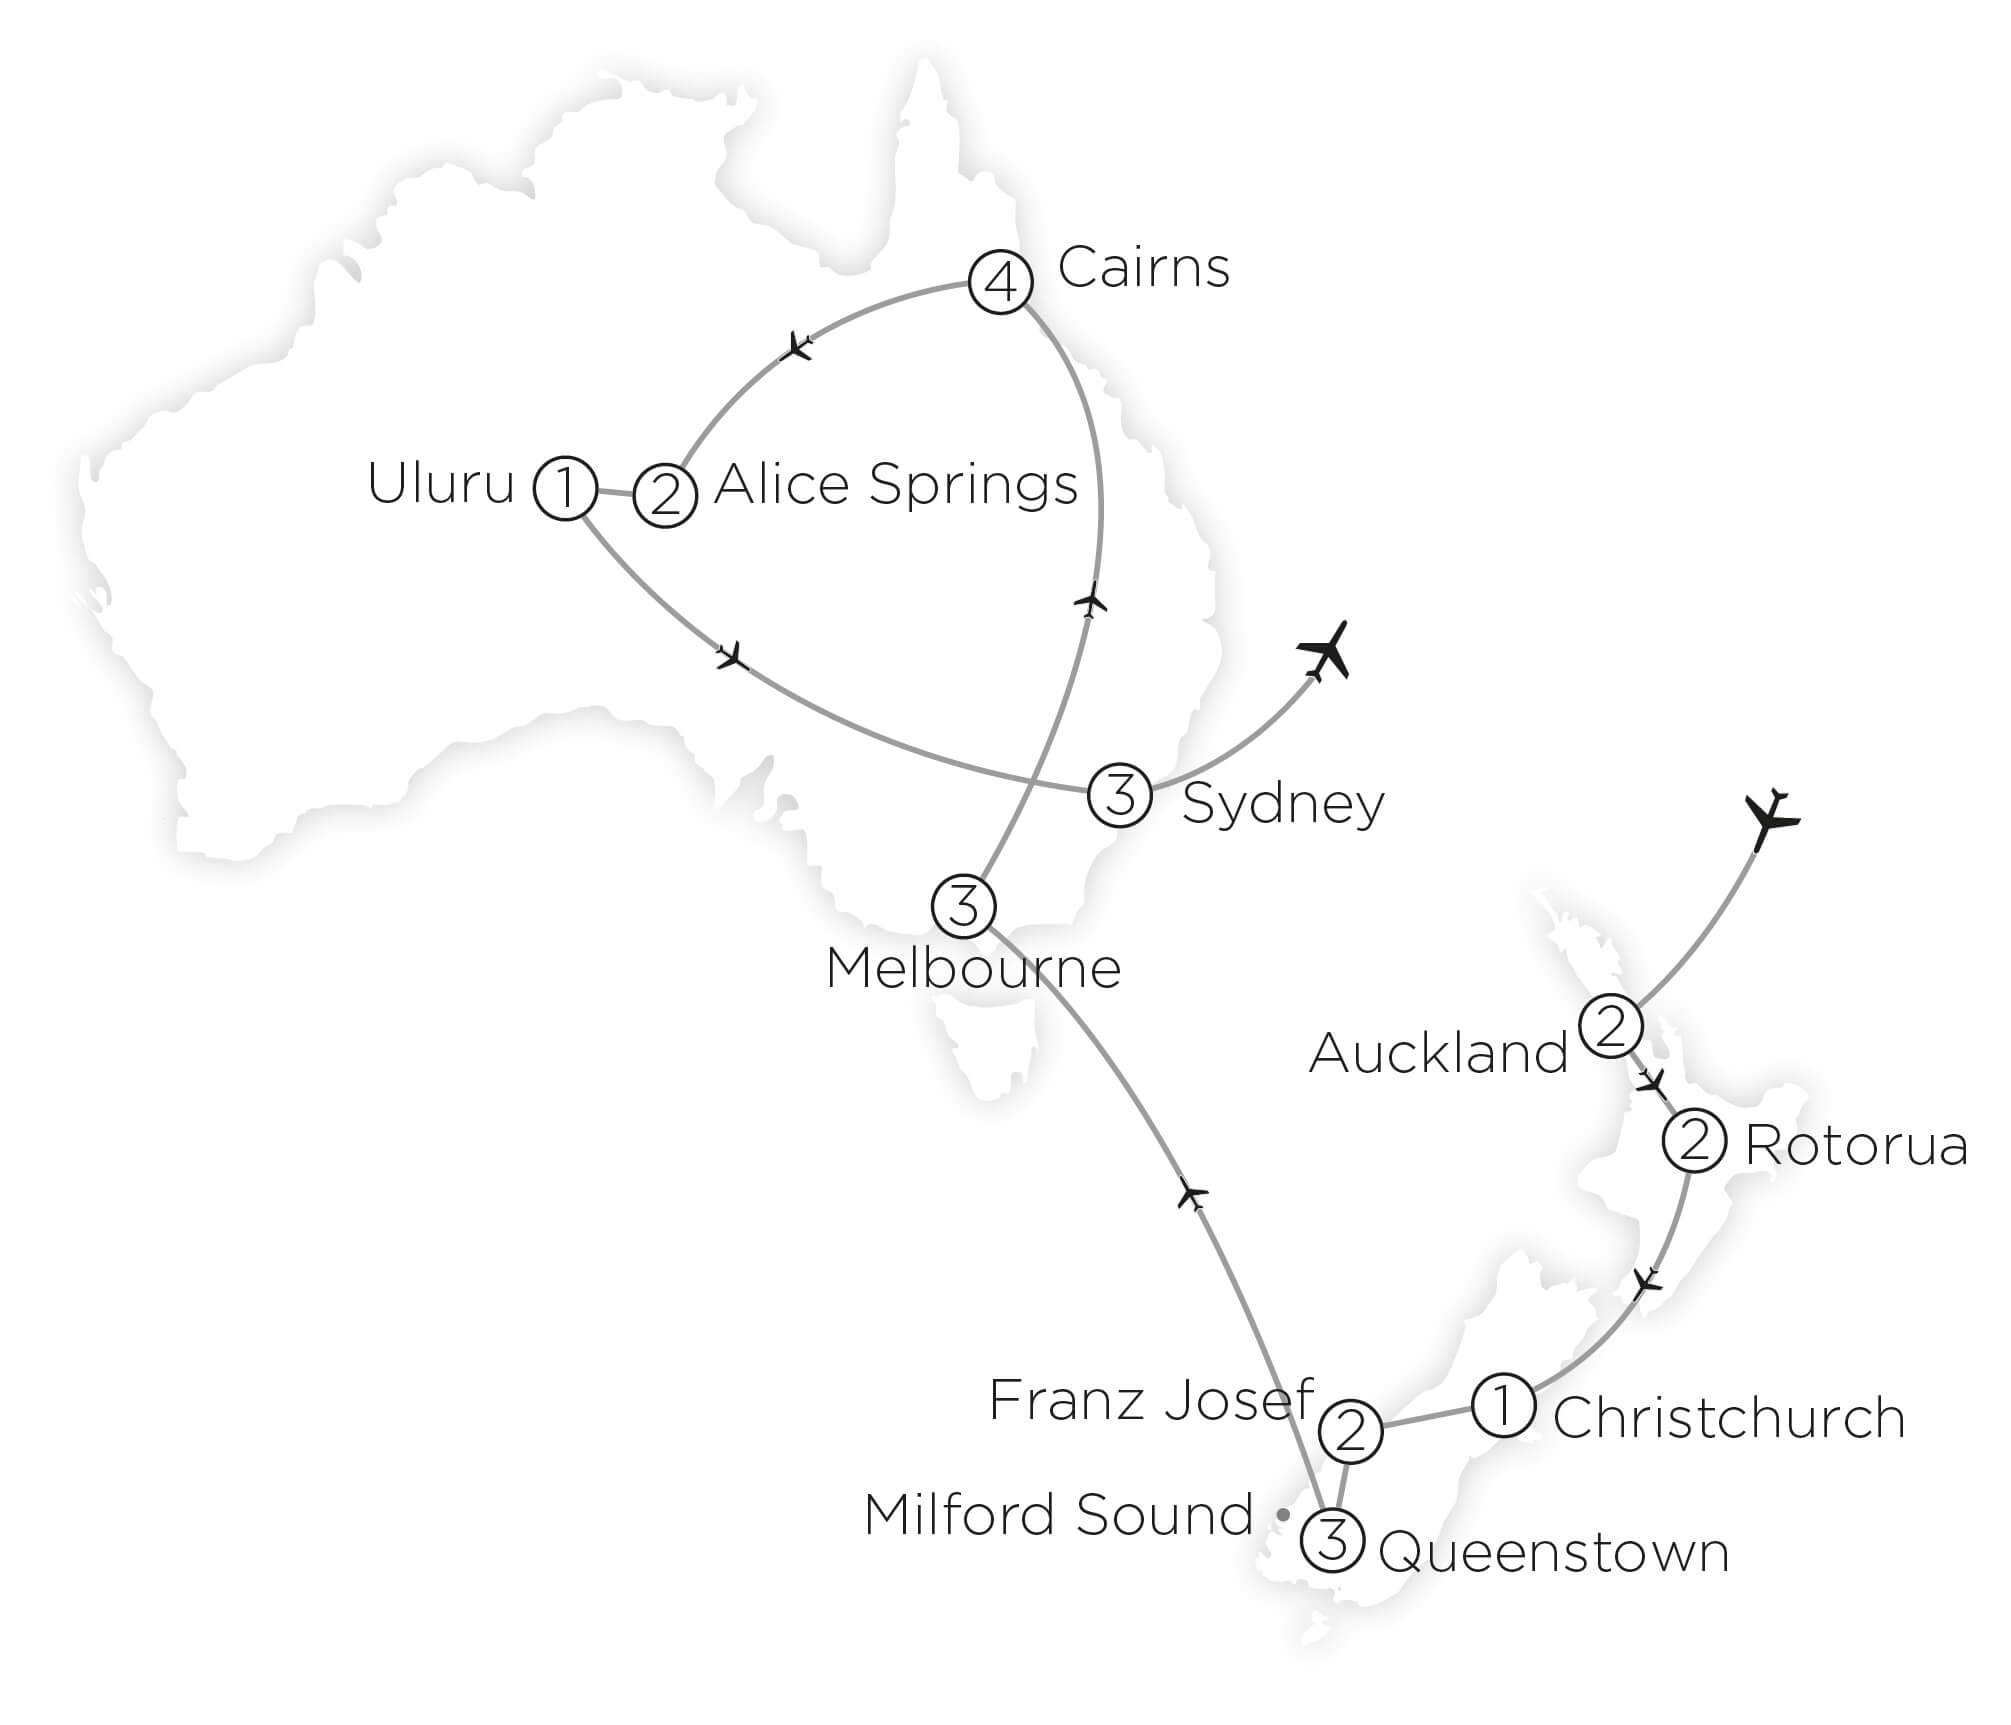 Highlights of Australia & New Zealand tour map 2019_20